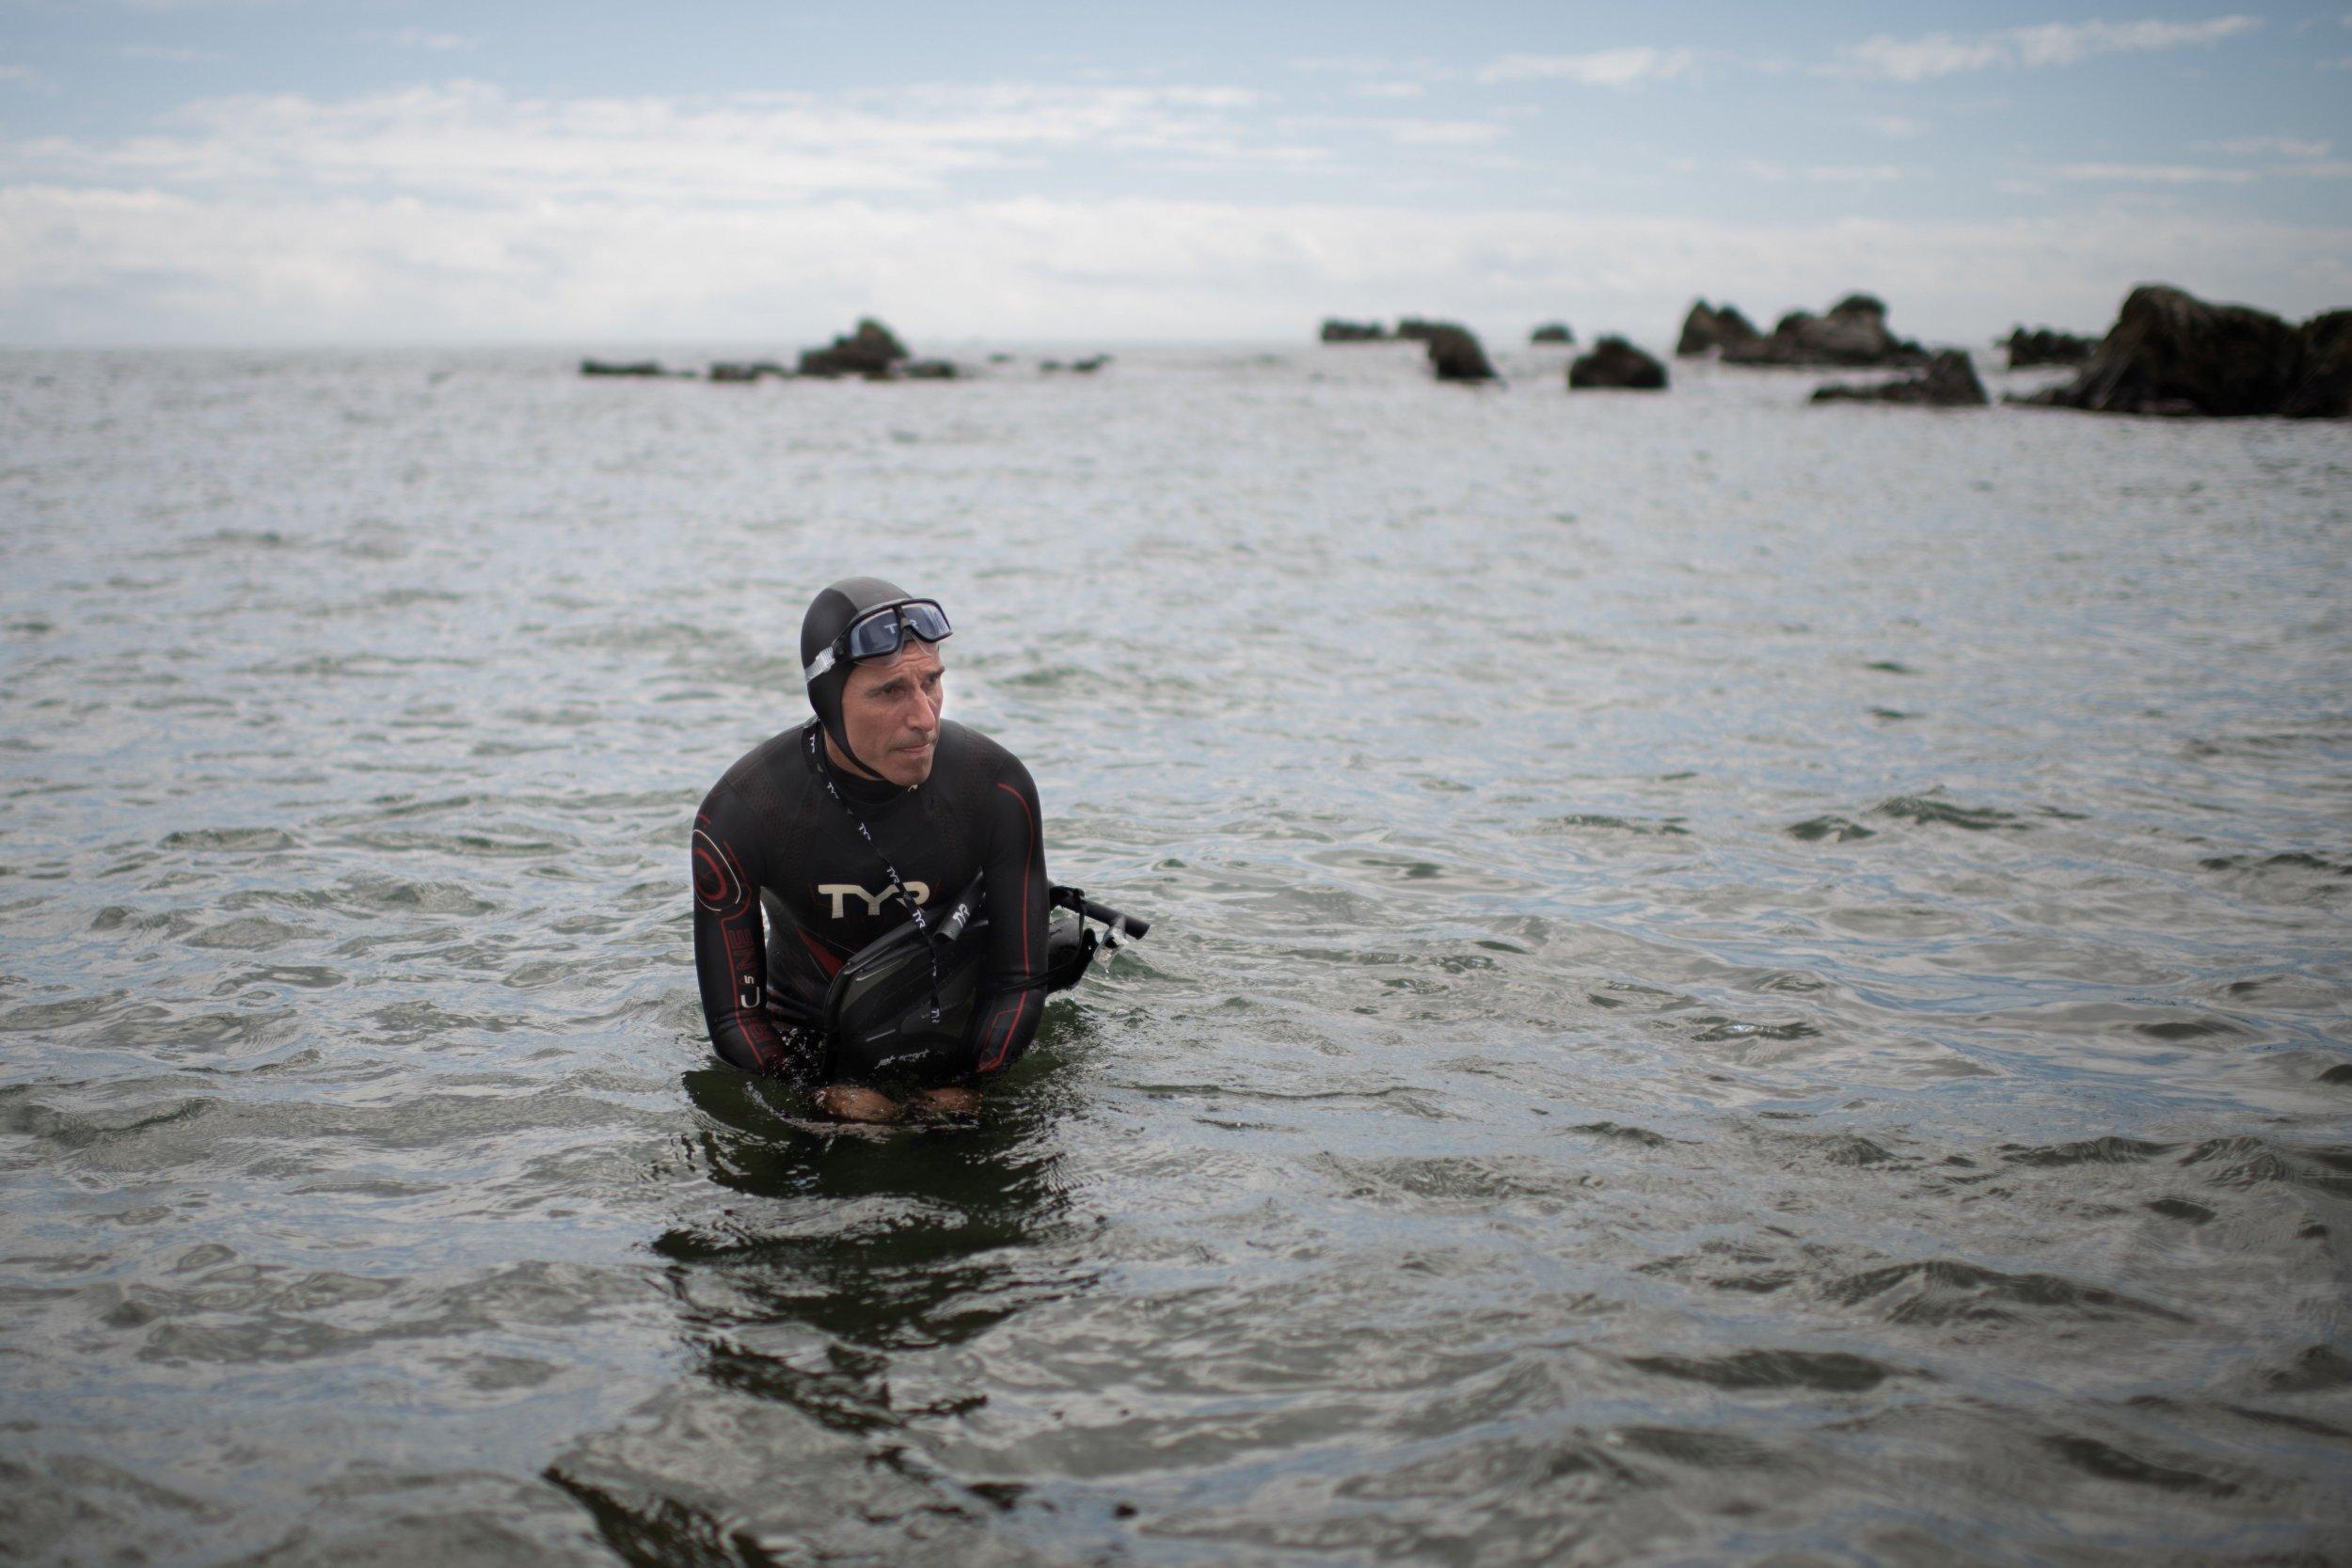 Benoit Lecomte, The Swim